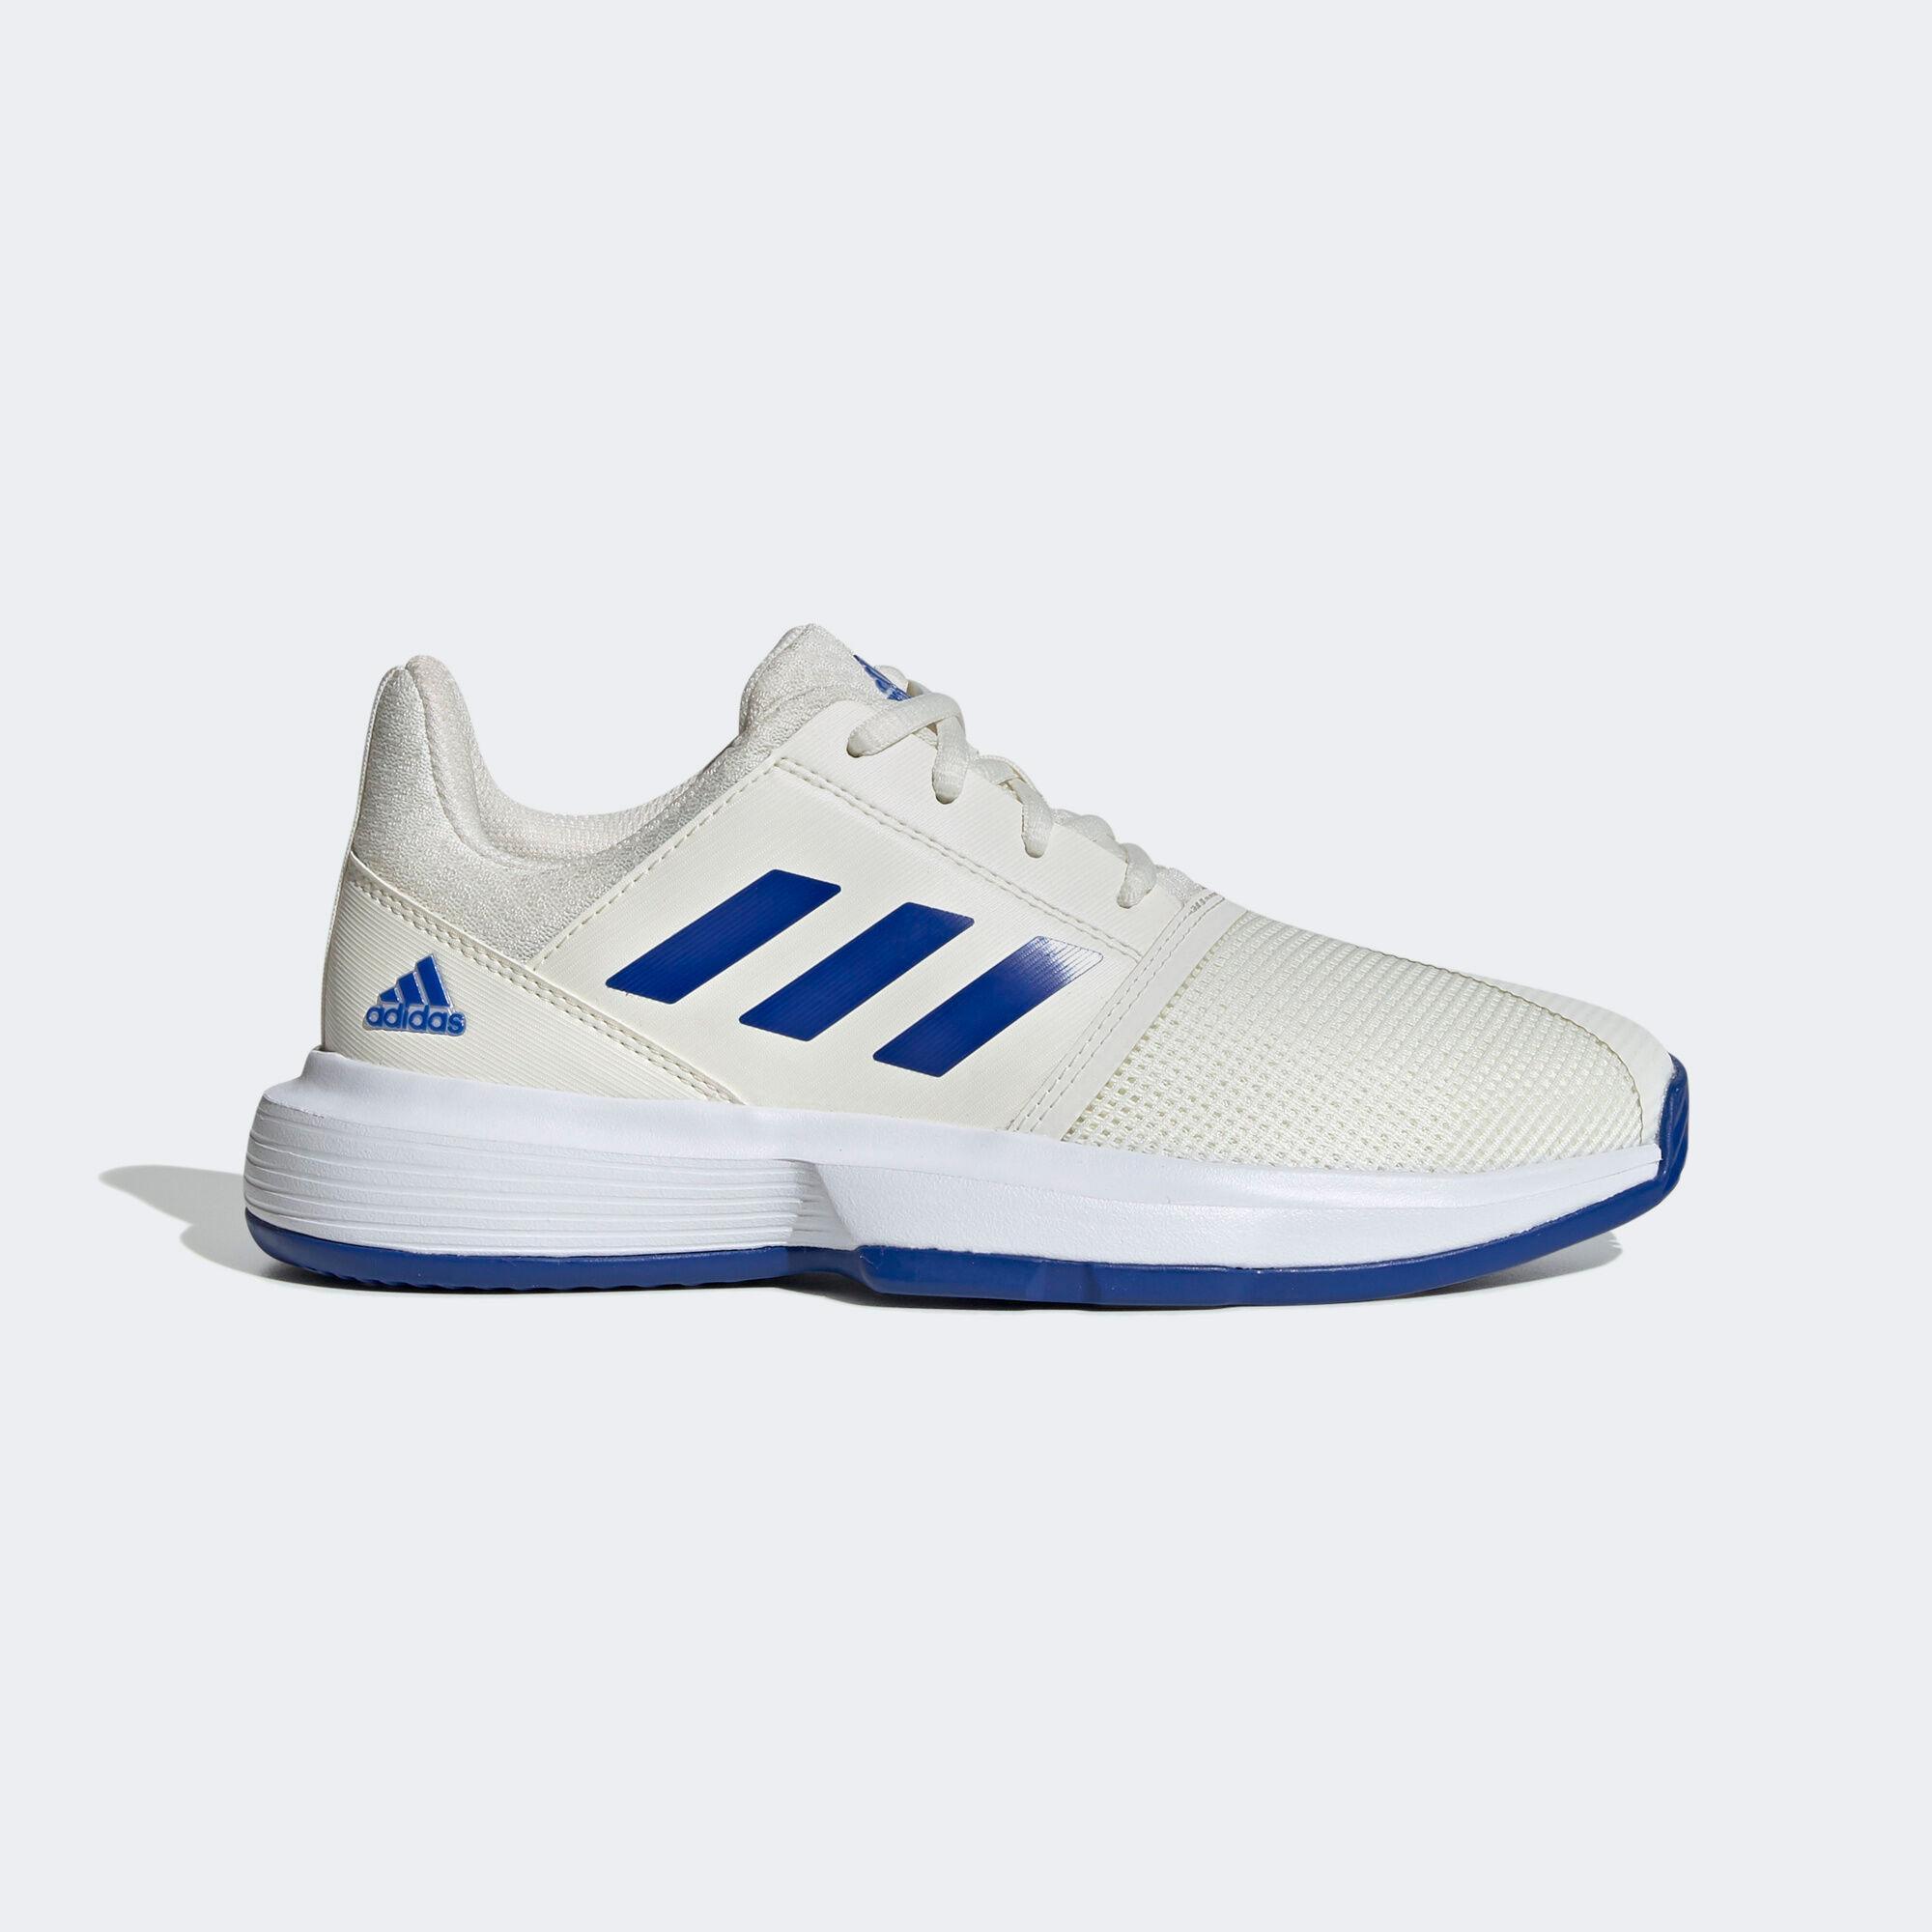 Adidas Kids CourtJam XJ Tennis Shoes - Off White/Blue